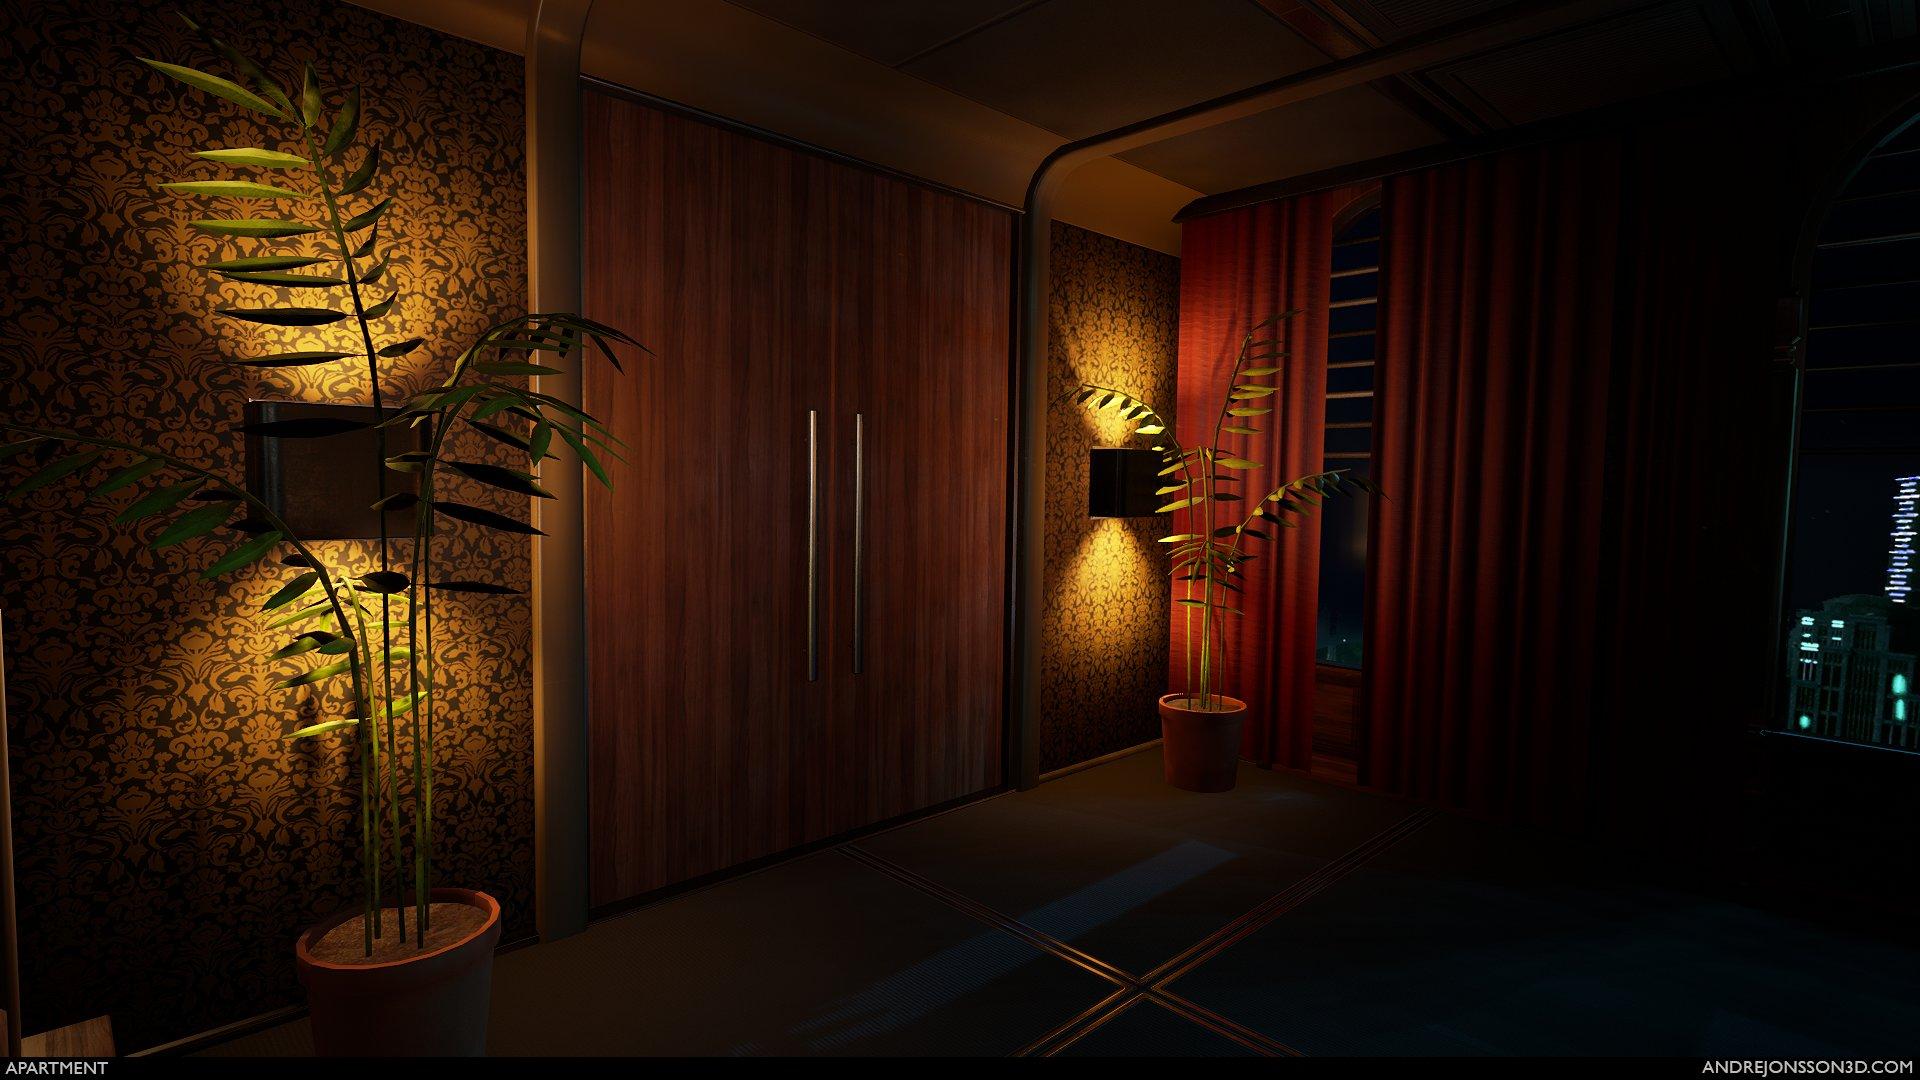 Andre jonsson apartment 07